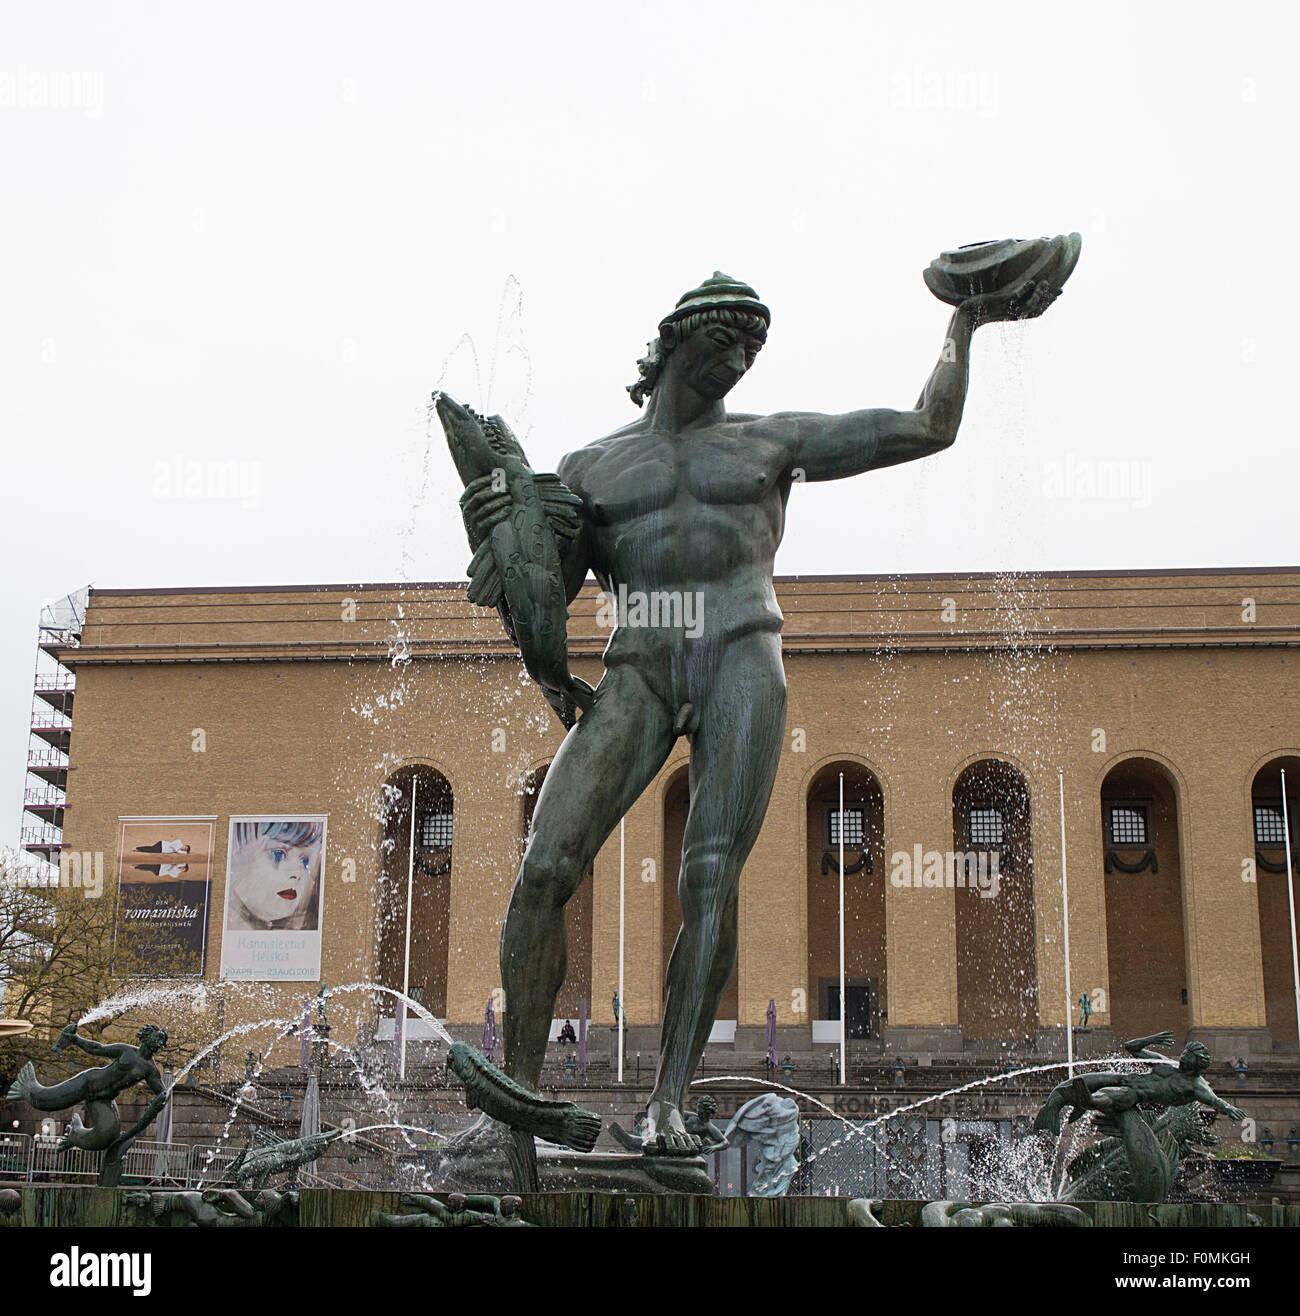 Poseidon statue, Gotenburg, Sweden - Stock Image